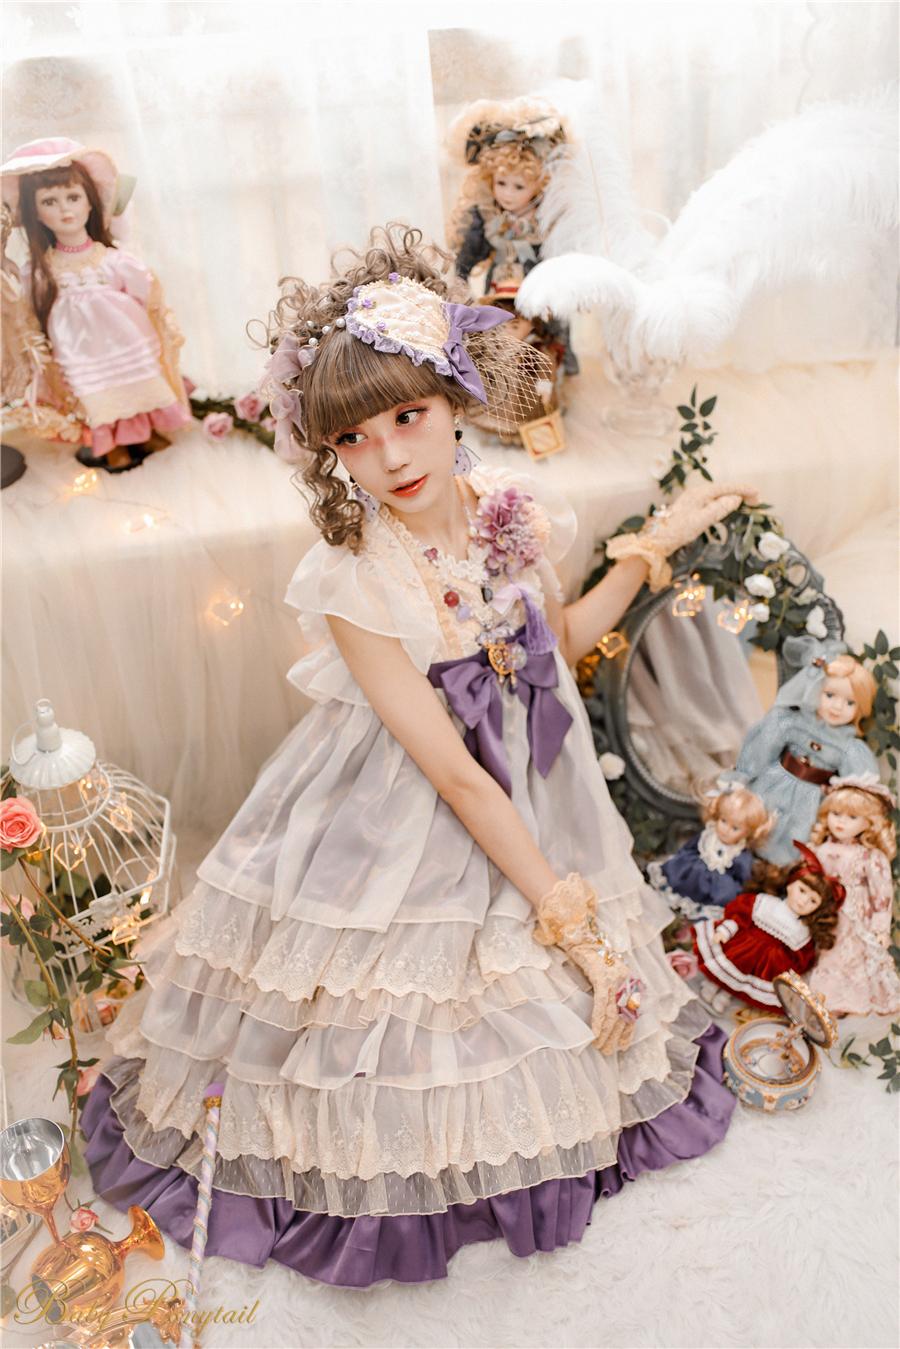 Babyponytail_Model Photo_Present Angel_JSK Violet_2_Kaka_13.jpg